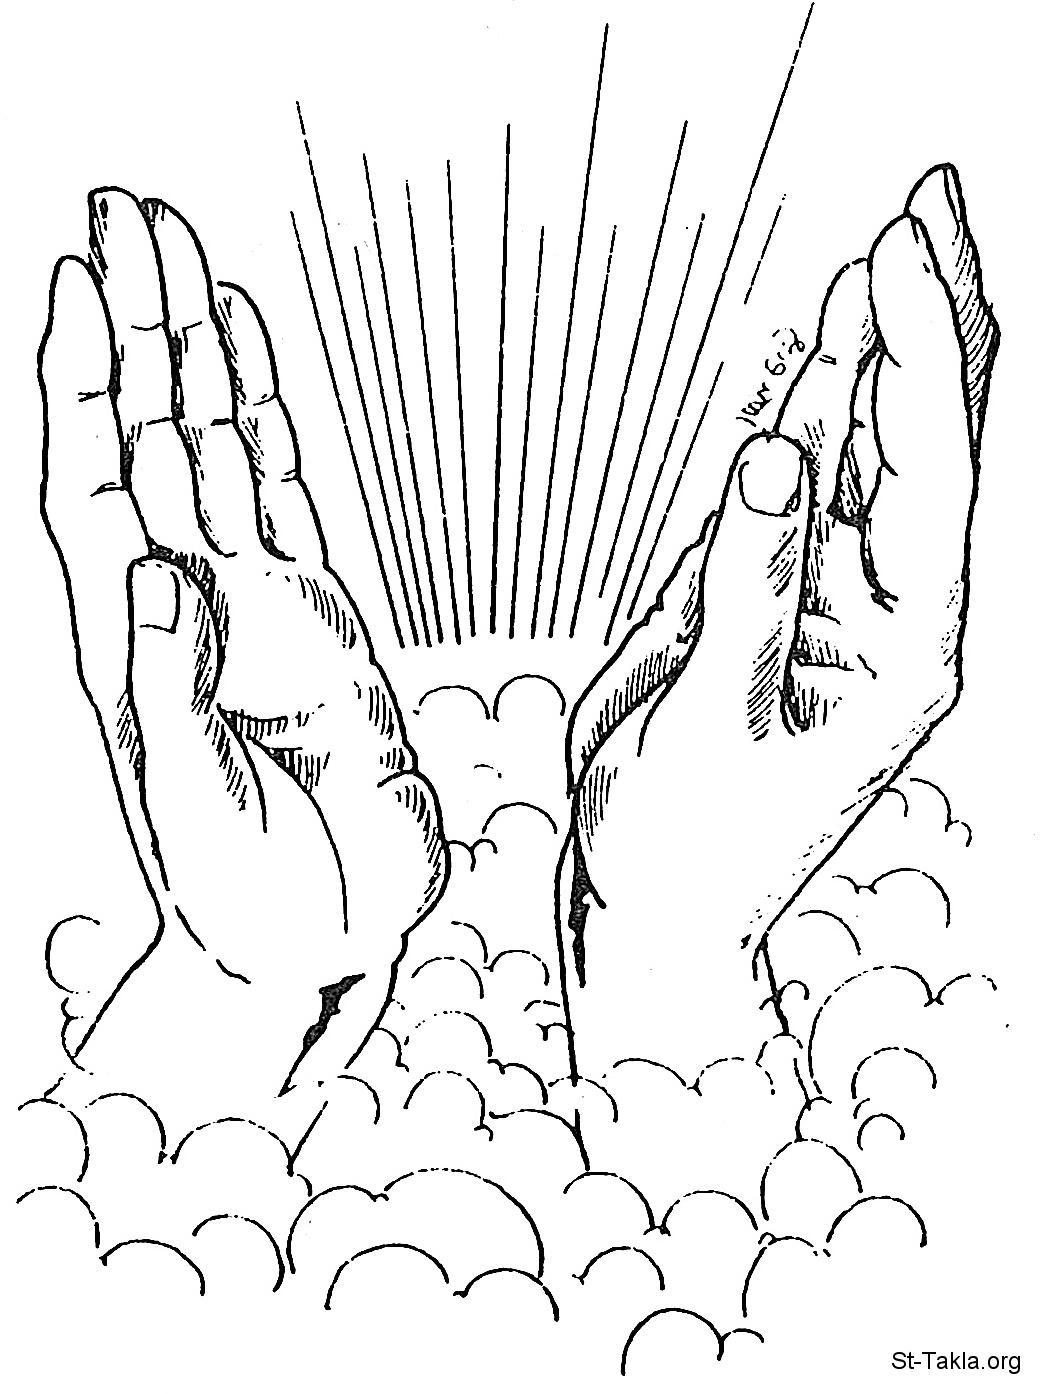 Image: Praying hands صورة يدان مصليتان، يدا المسيح